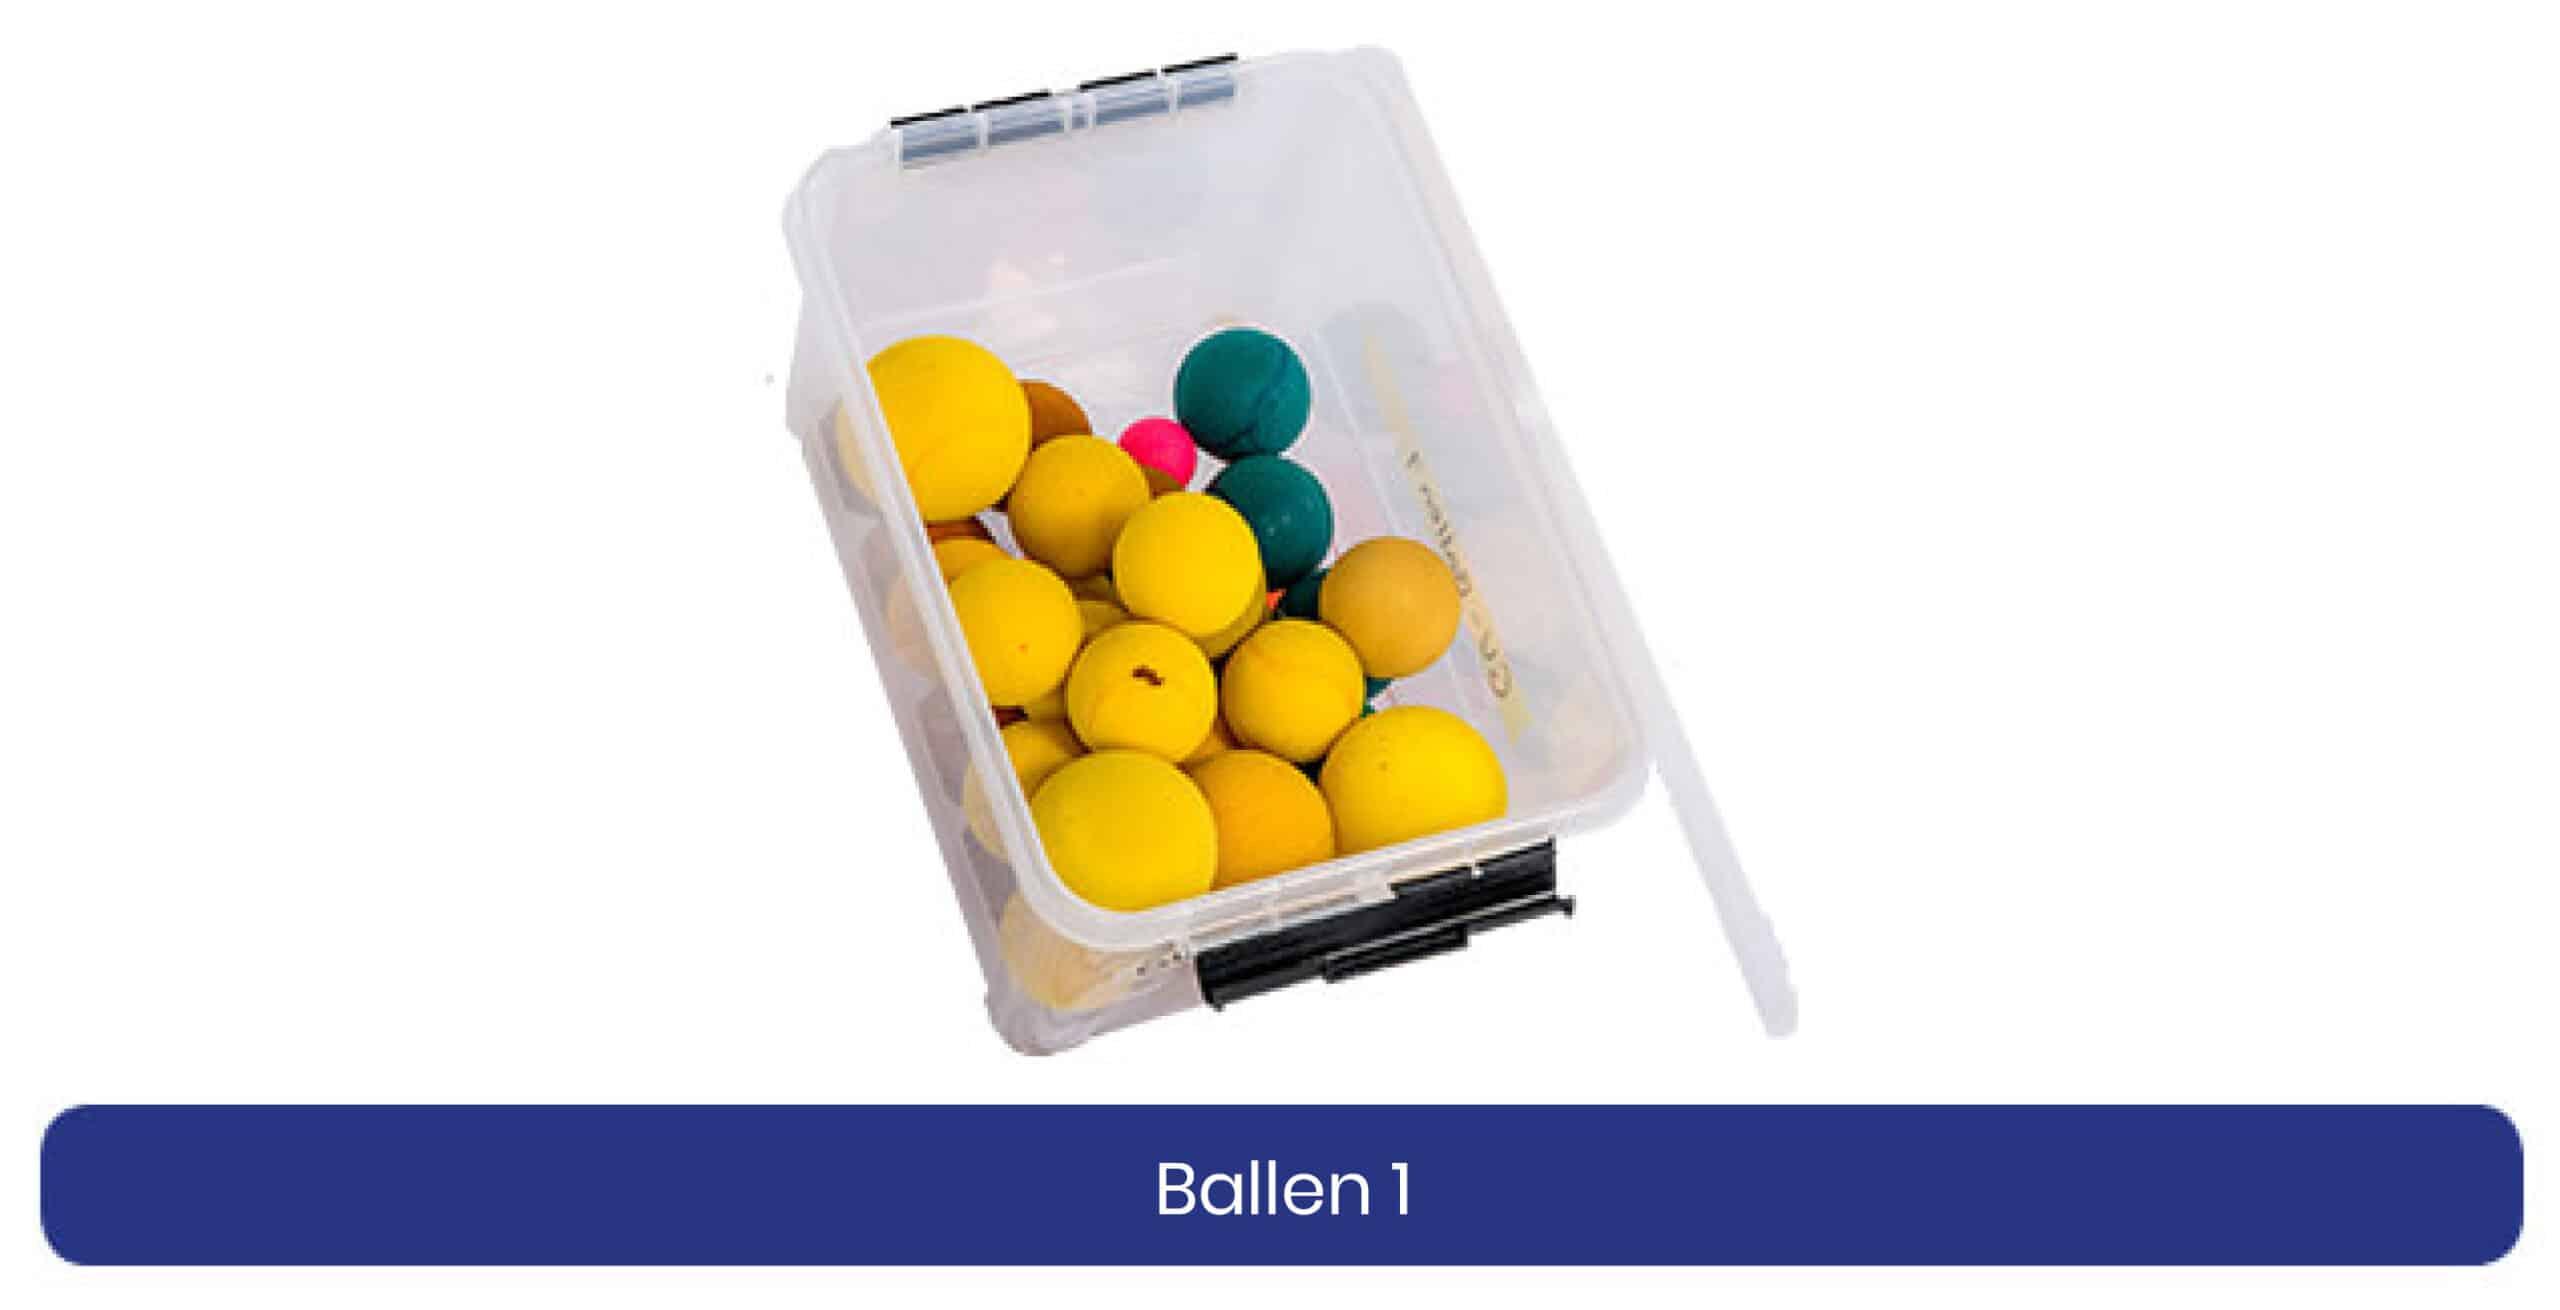 Ballen 1 lenen product